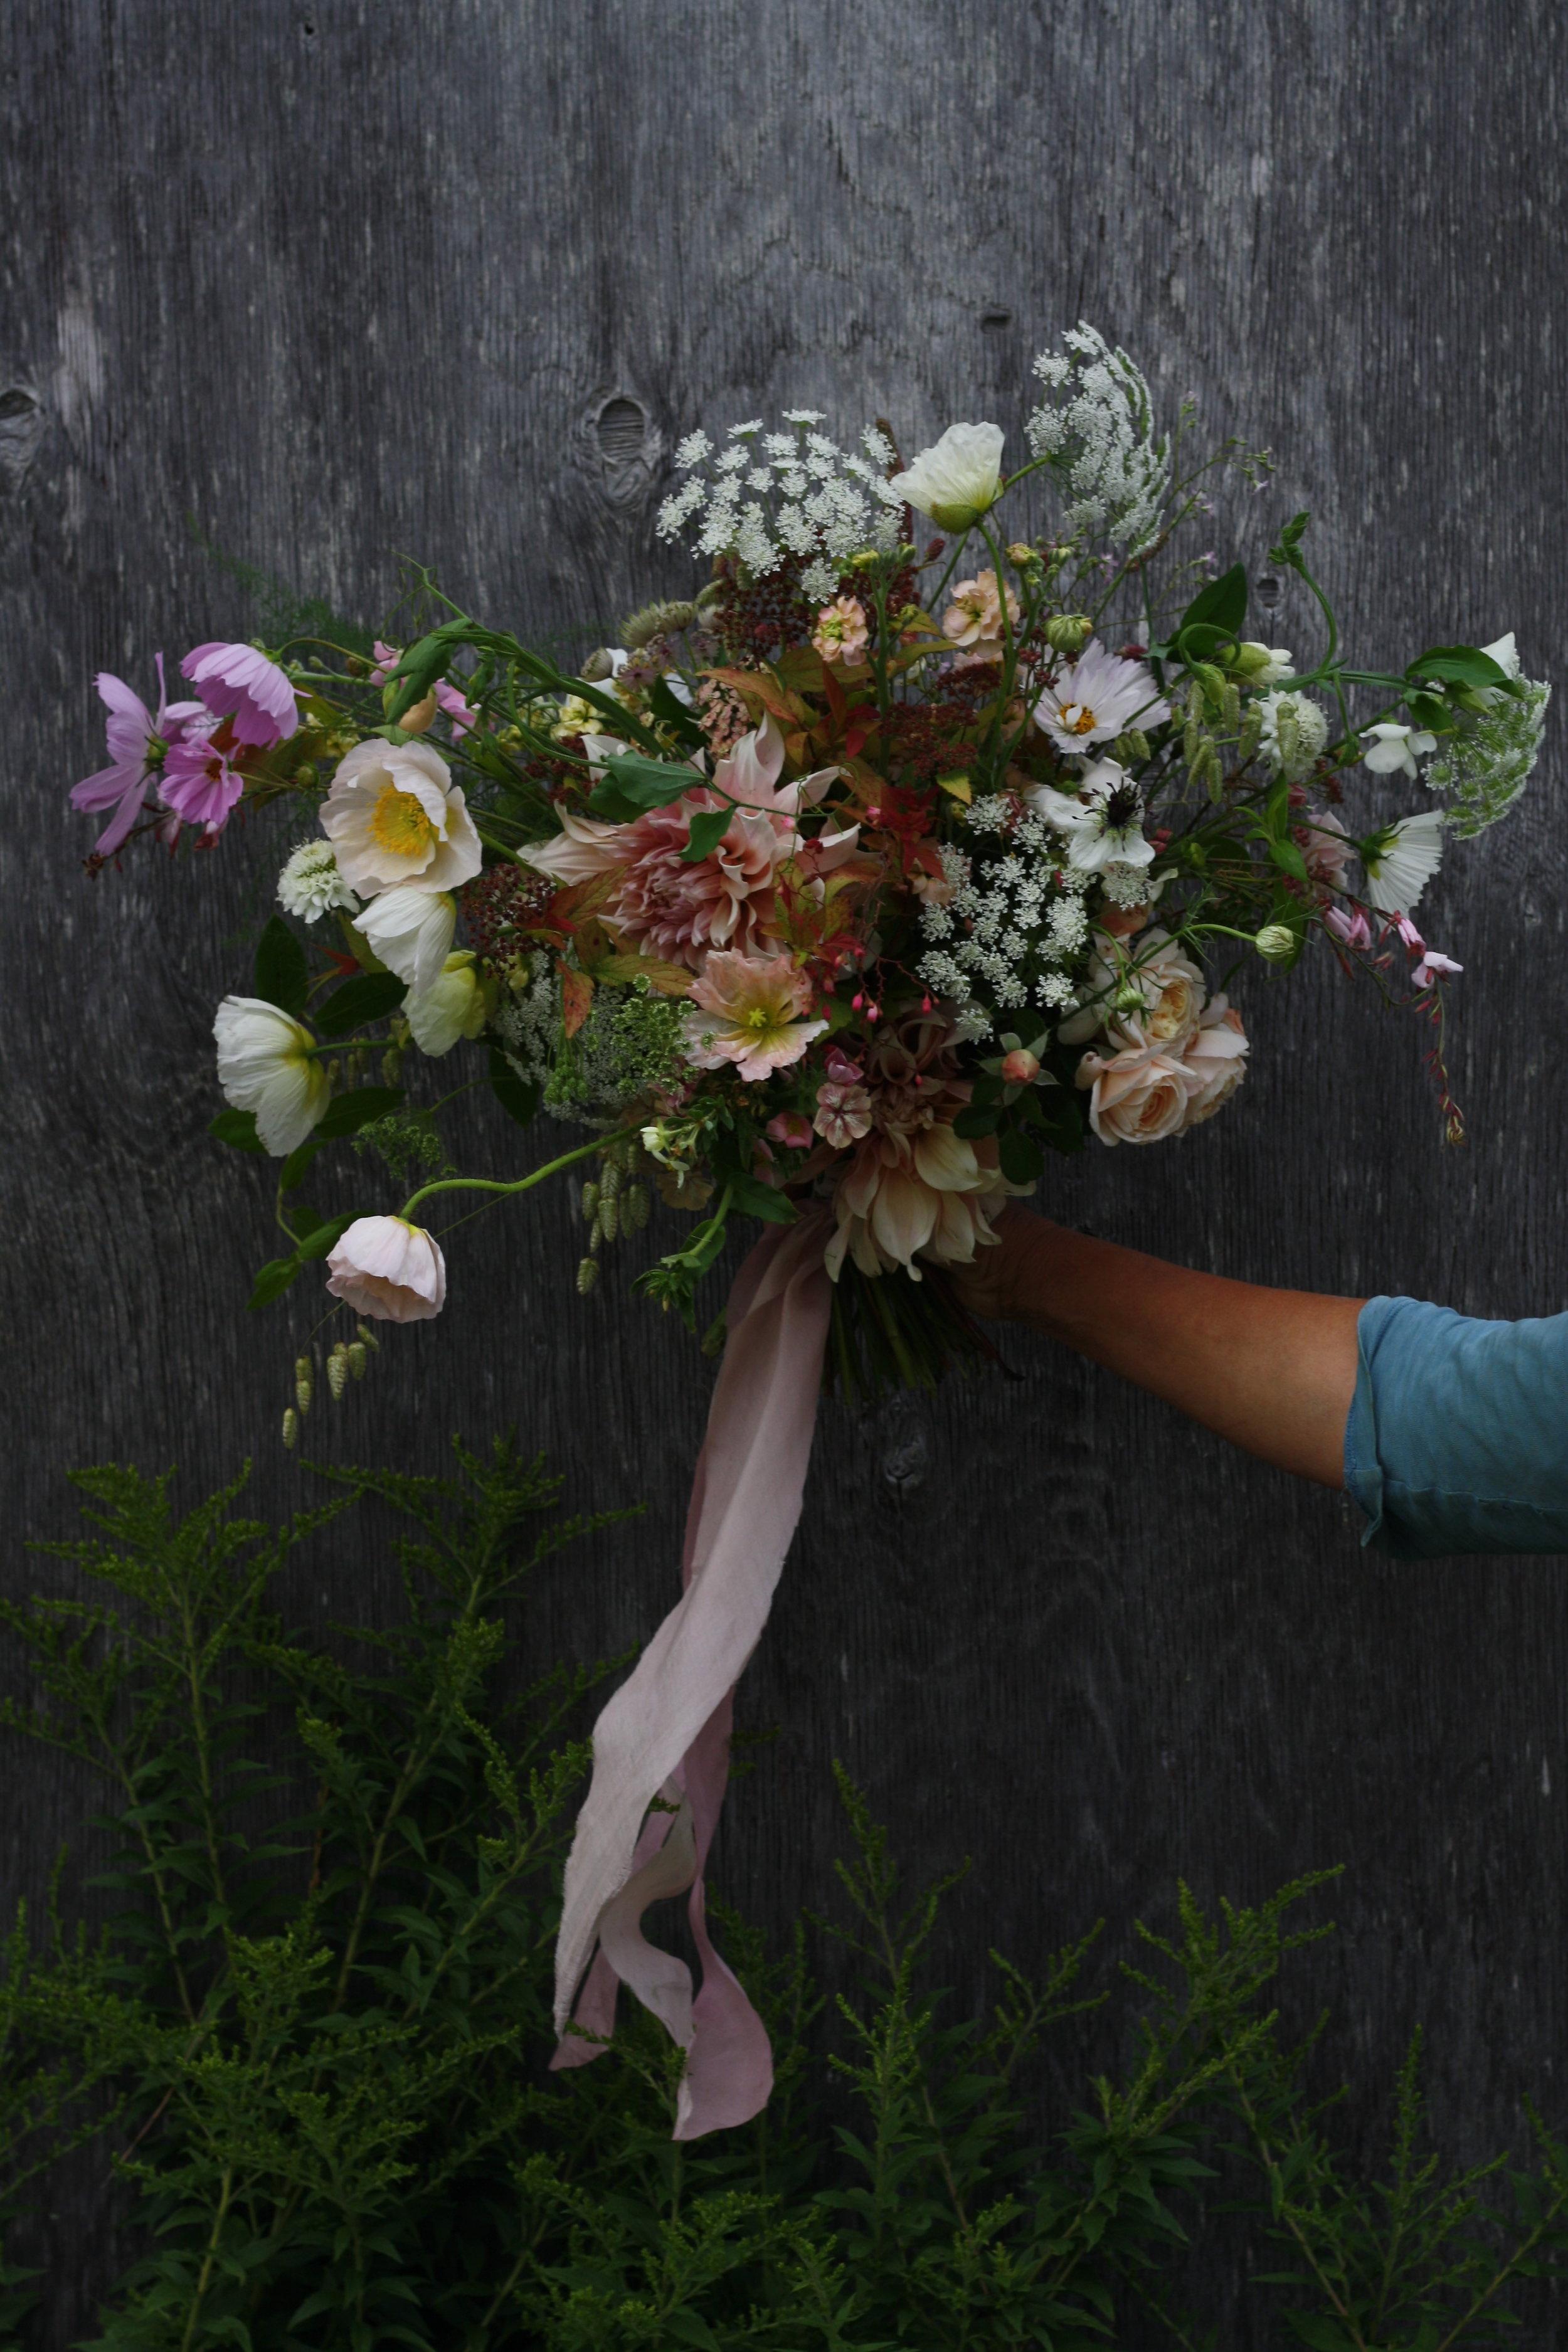 Bridal bouquet featuring, Colibri iceland poppy 'Bianco', David Austin garden rose 'Crocus' and Cafe Au Lait' dahlia.